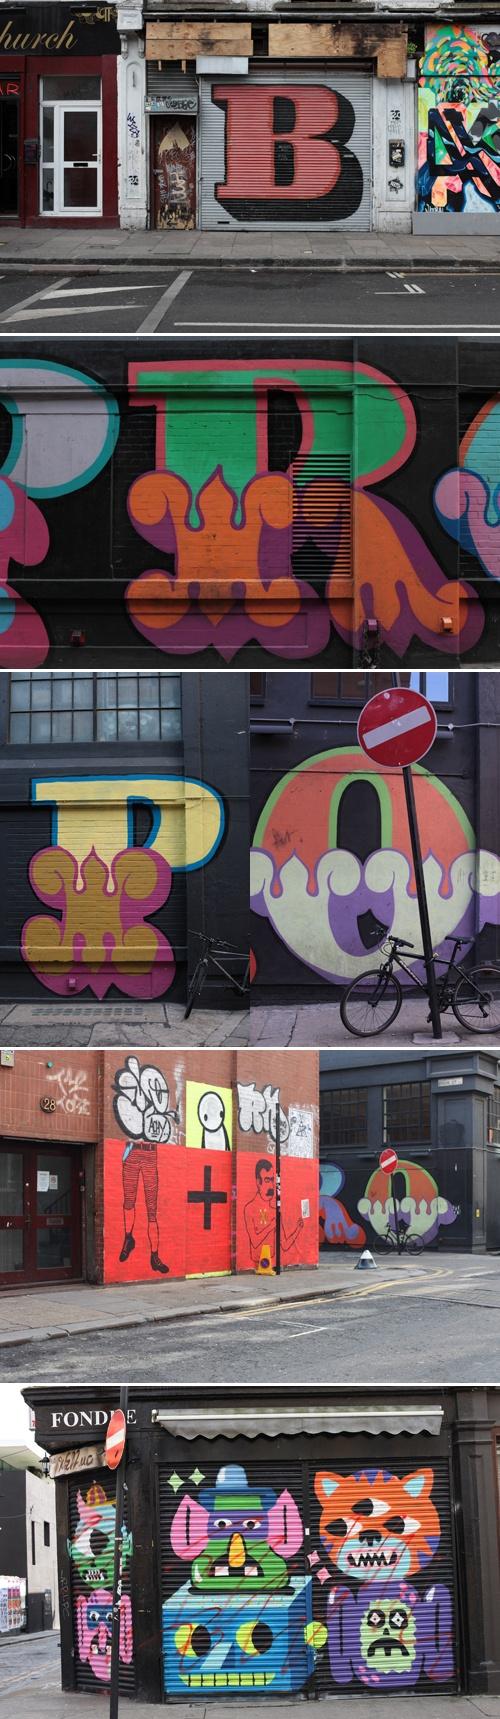 london type graffiti